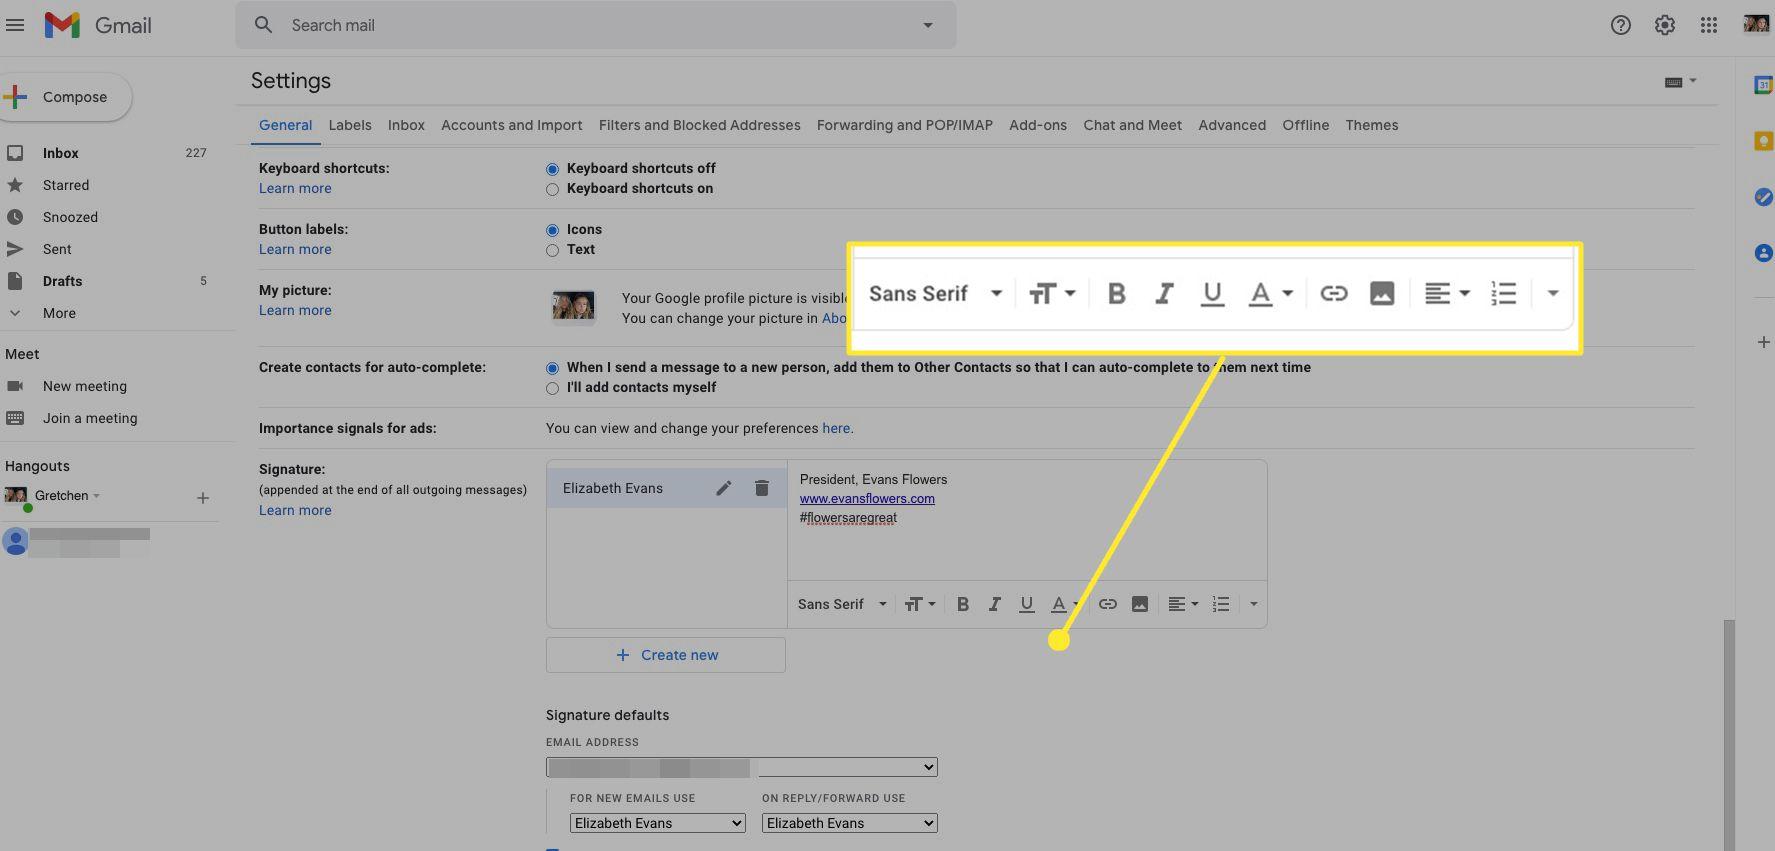 Gmail signature formatting toolbar highlighted